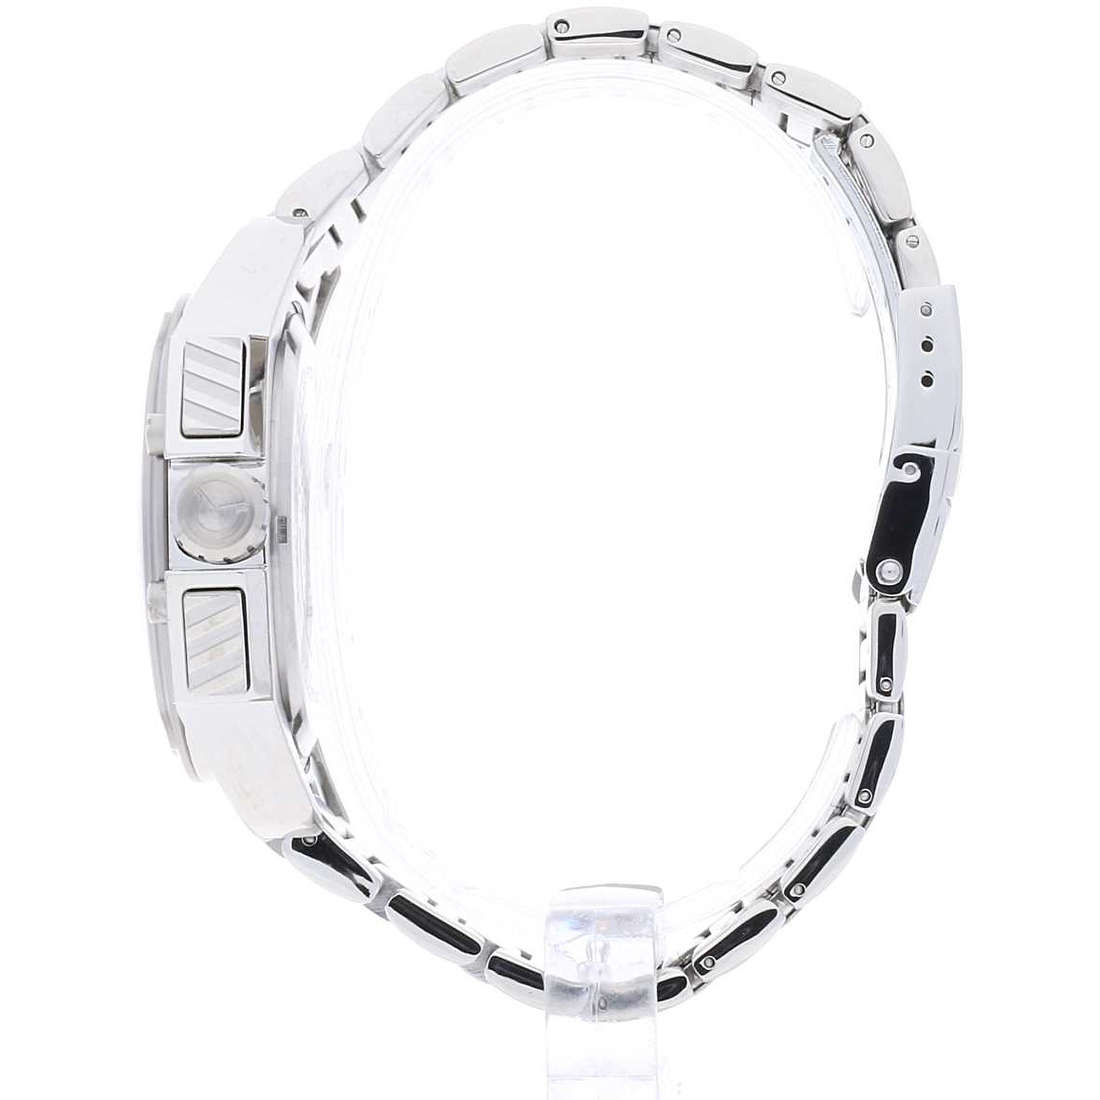 prix montres homme Sector R3273981001